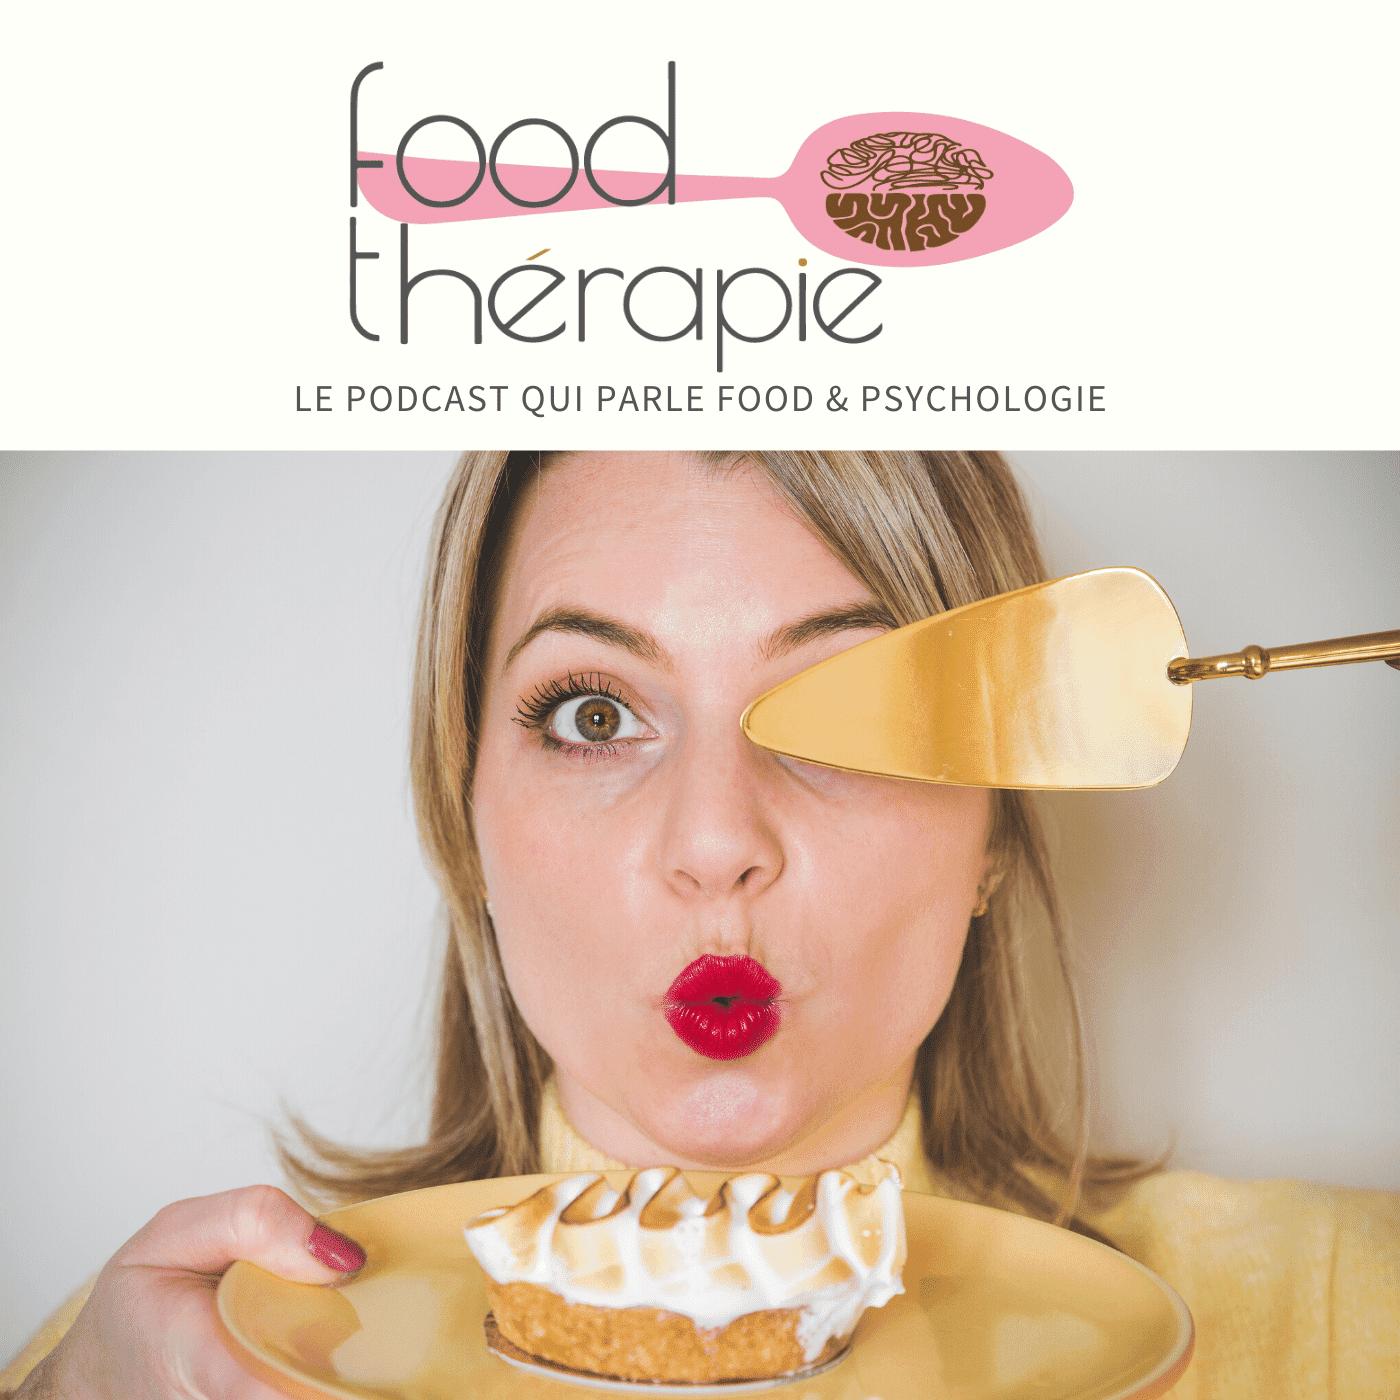 Artwork for podcast Food Thérapie